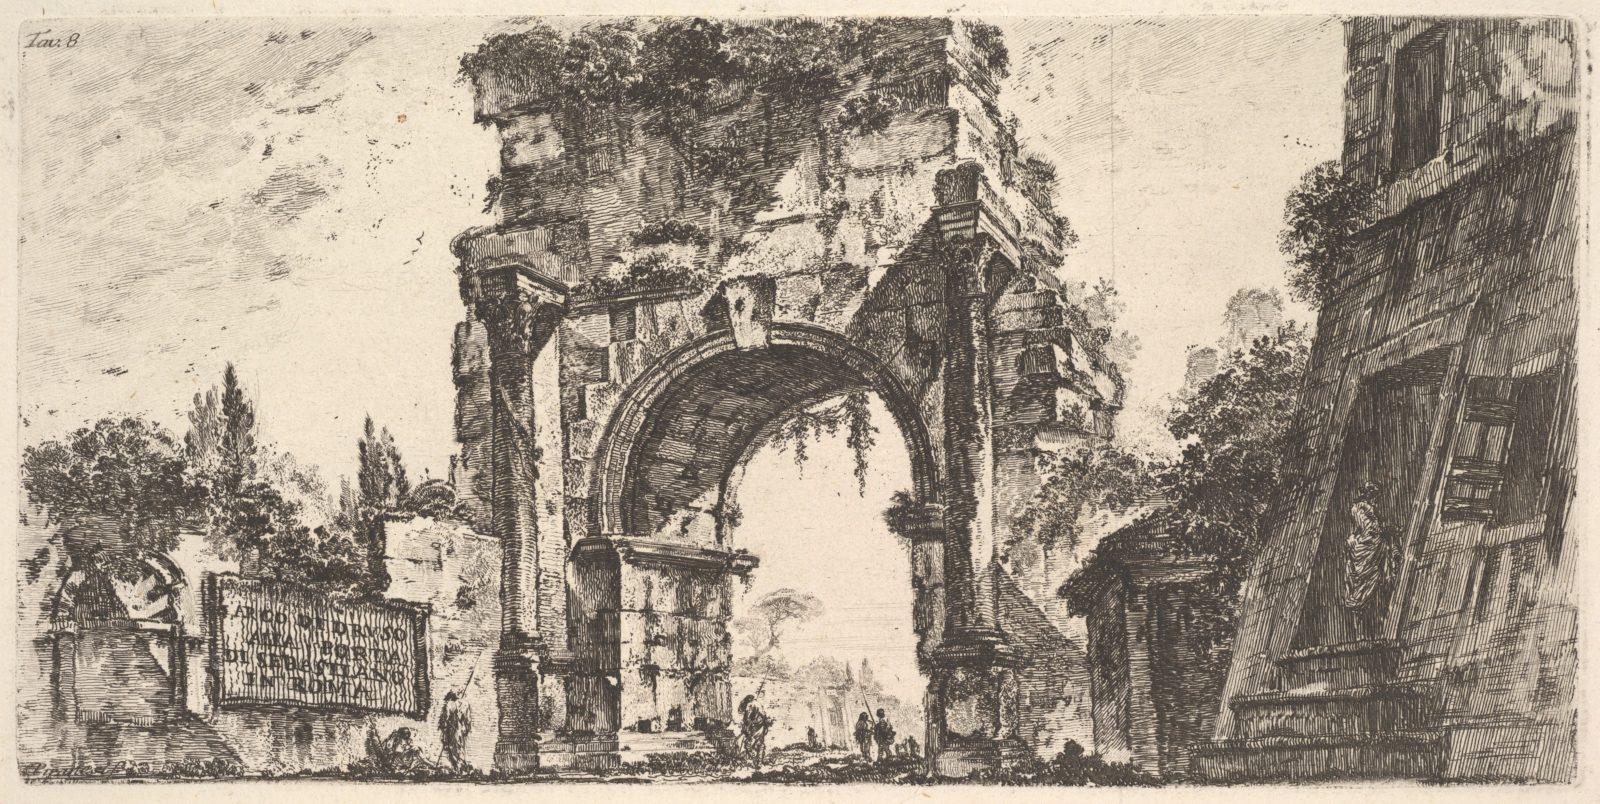 Plate 8: Arch of Drusus at the Porta S. Sebastiano in Rome (Arco di Druso alla Porta di Sebastiano in Roma)